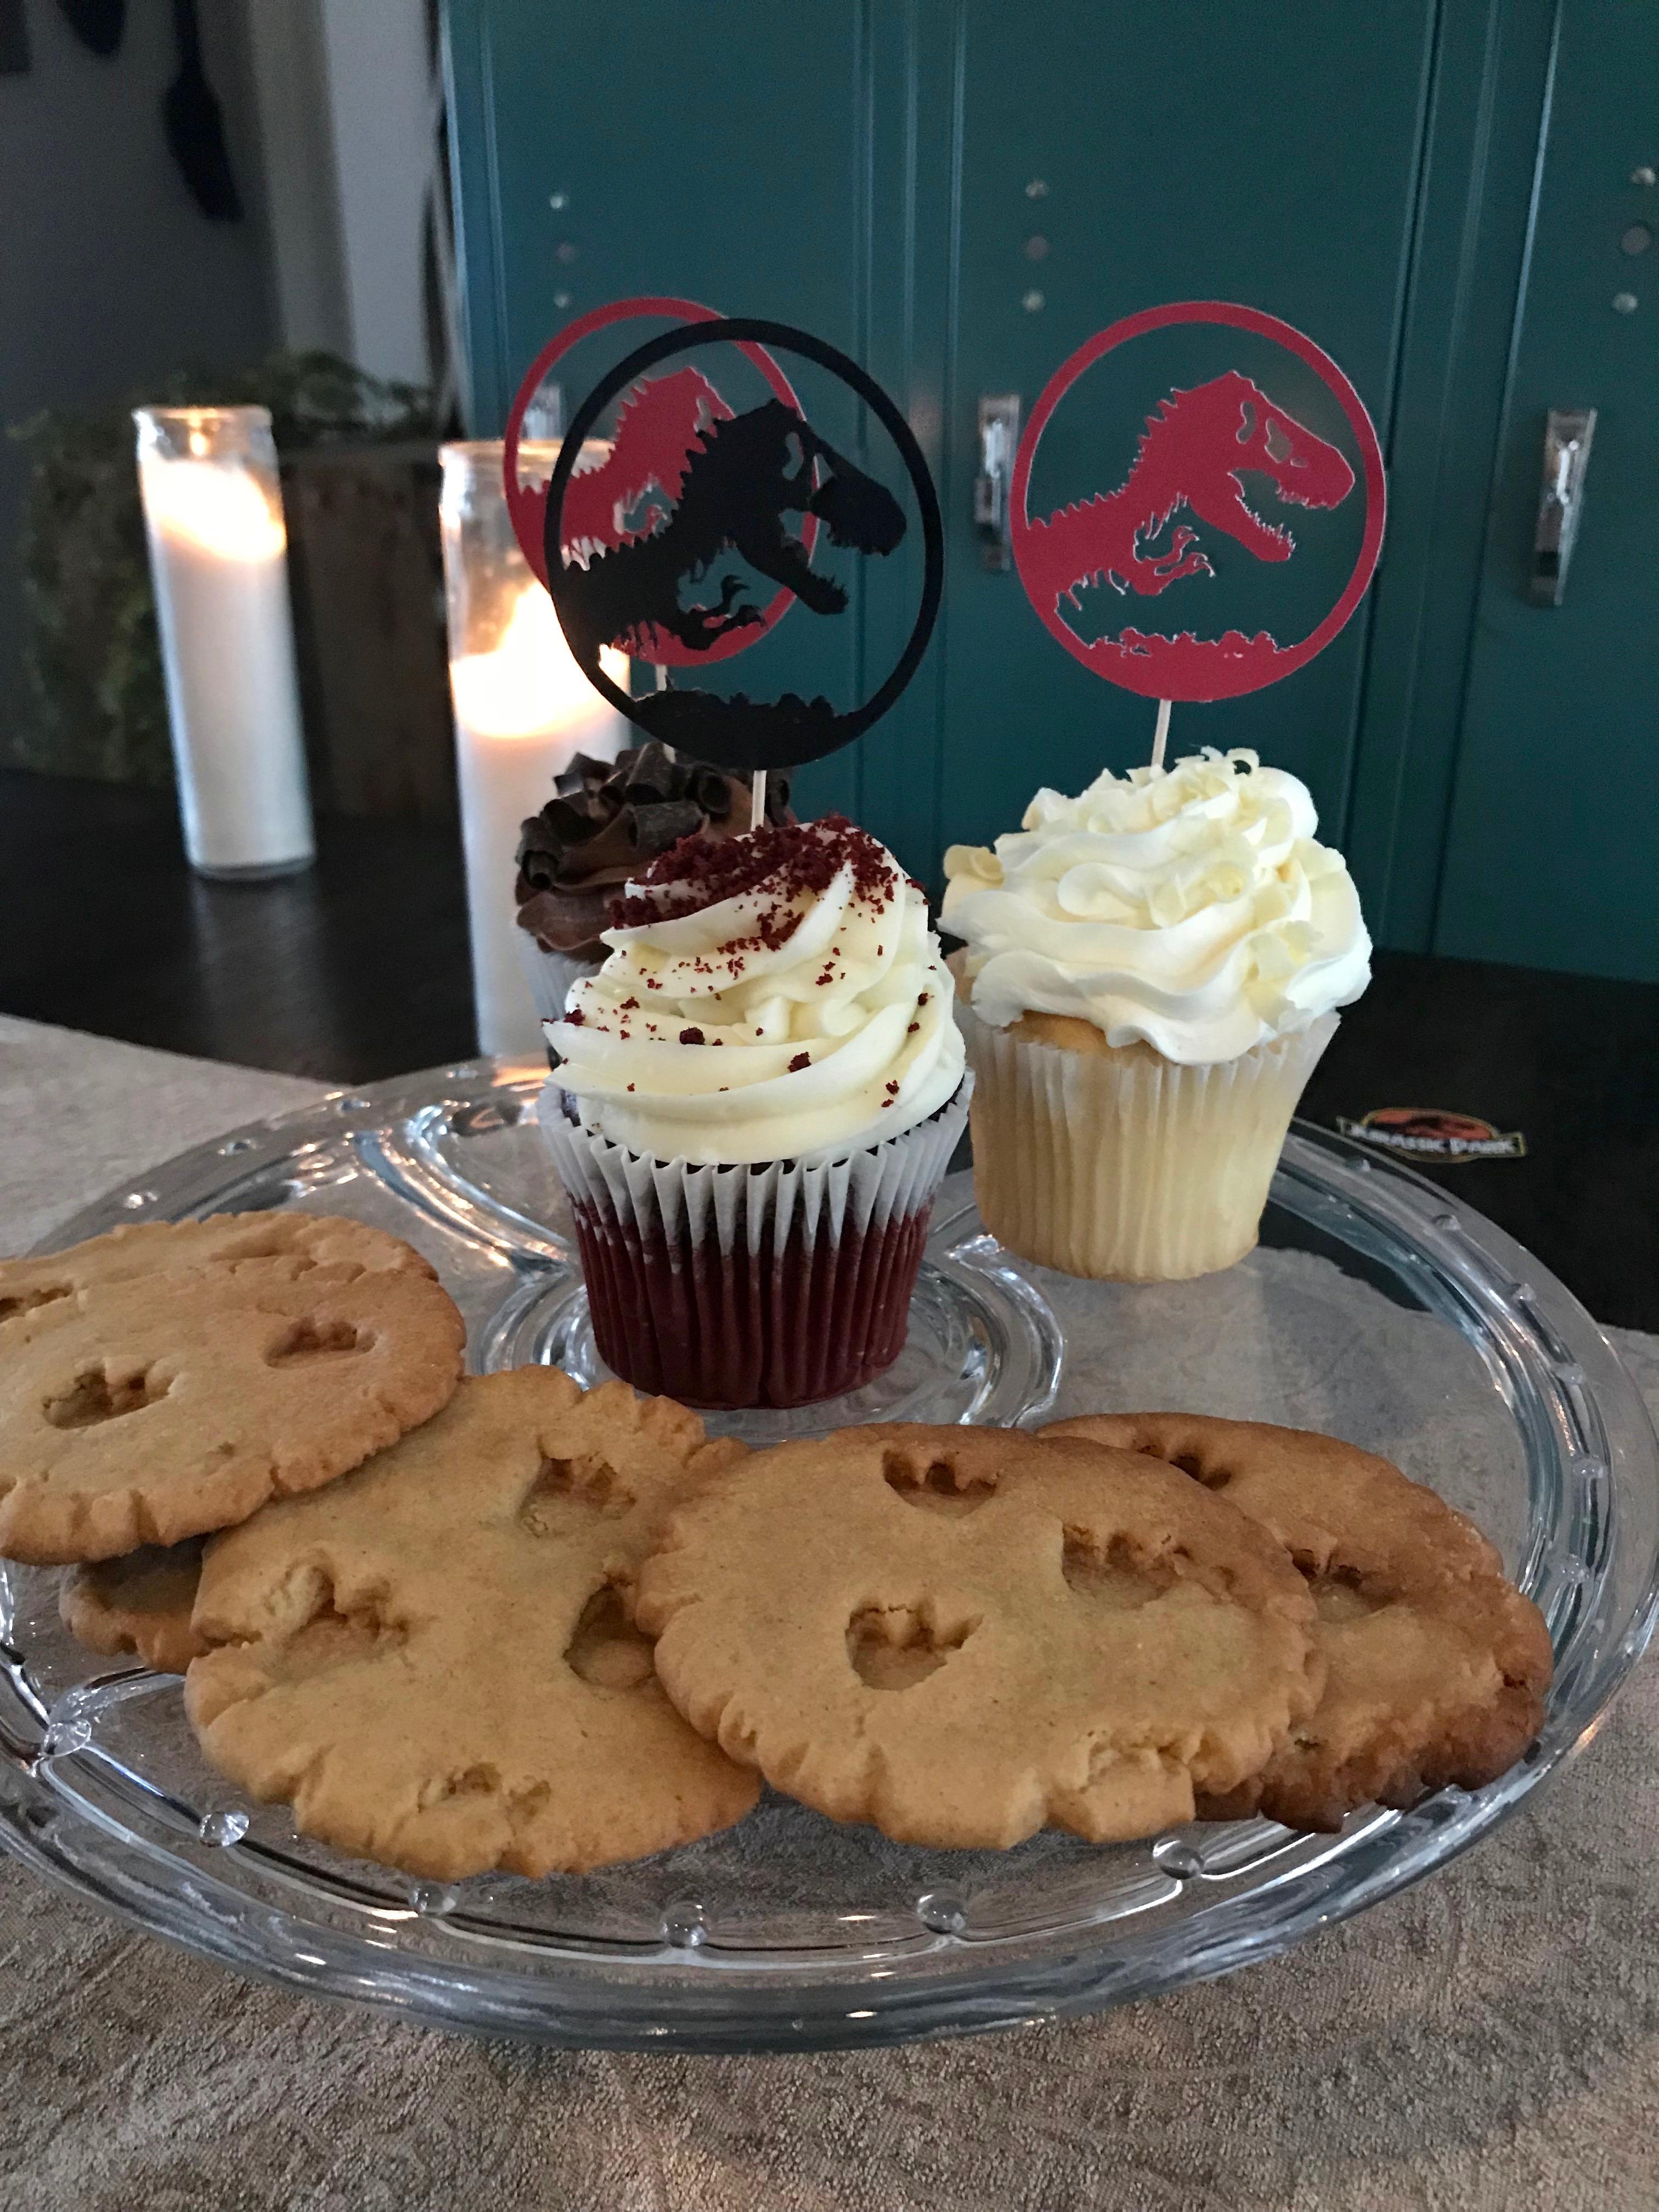 Jurassic Park Cupcakes